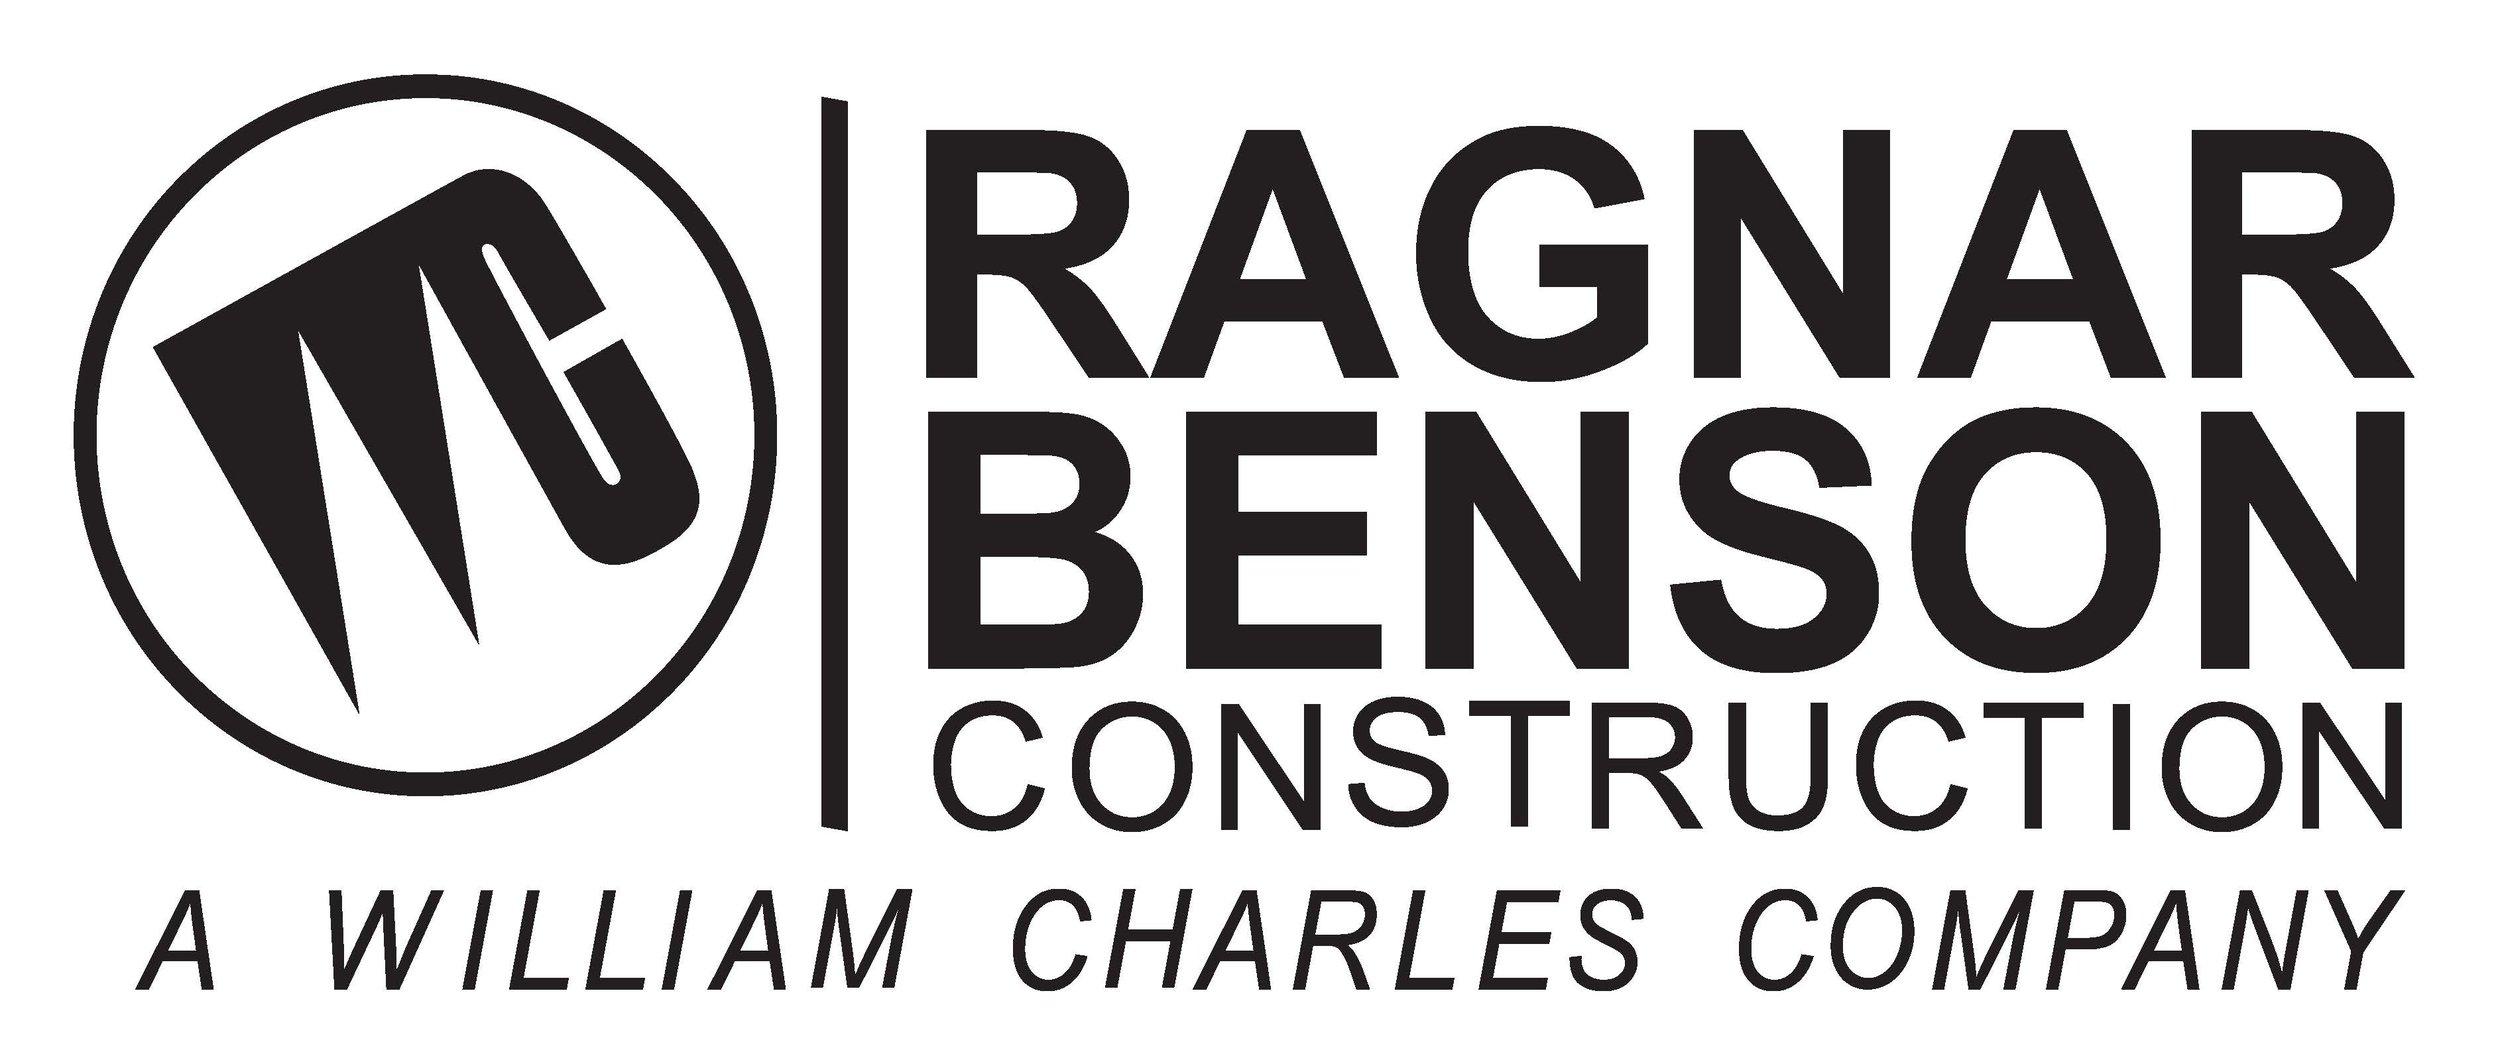 Ragnar Benson Construction